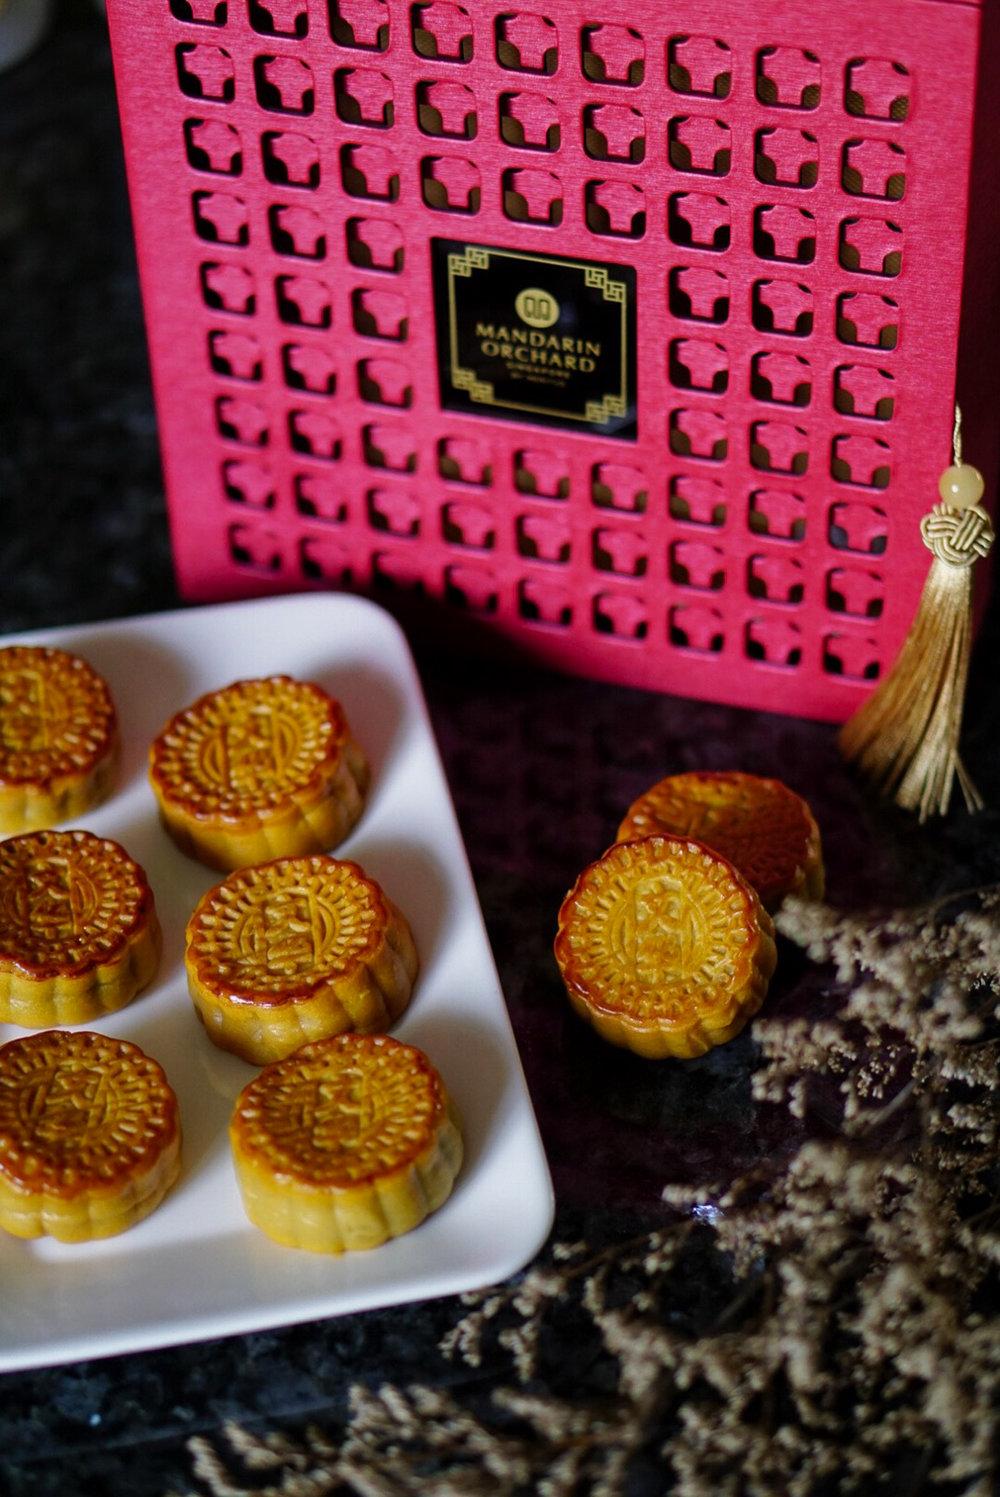 Mandarin-Orchard-Singapore-Mooncakes-Limited-Edition-Assorted-Mini-Baked-Mooncake.jpg